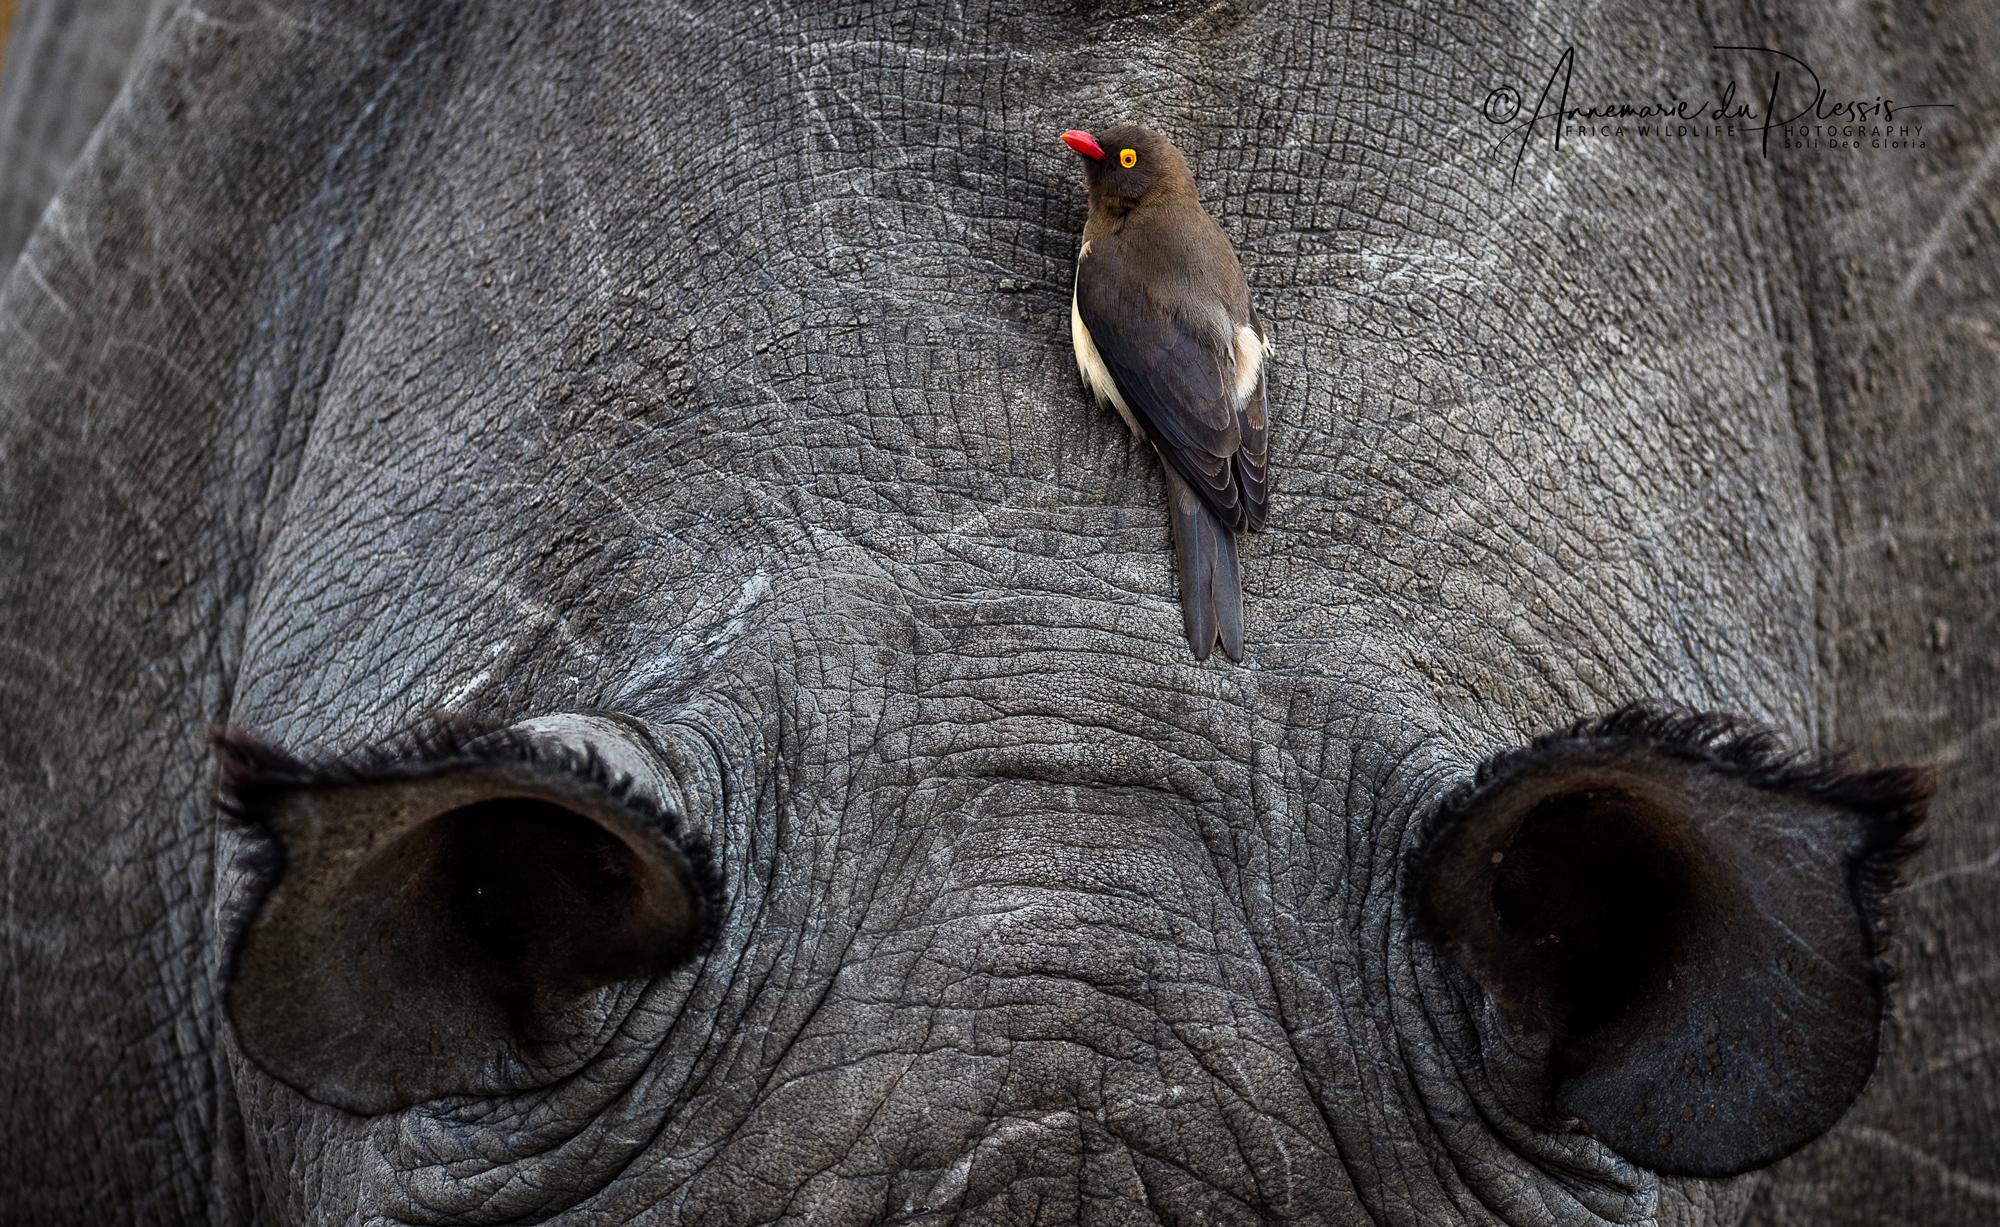 Oxpecker sitting on head of rhino